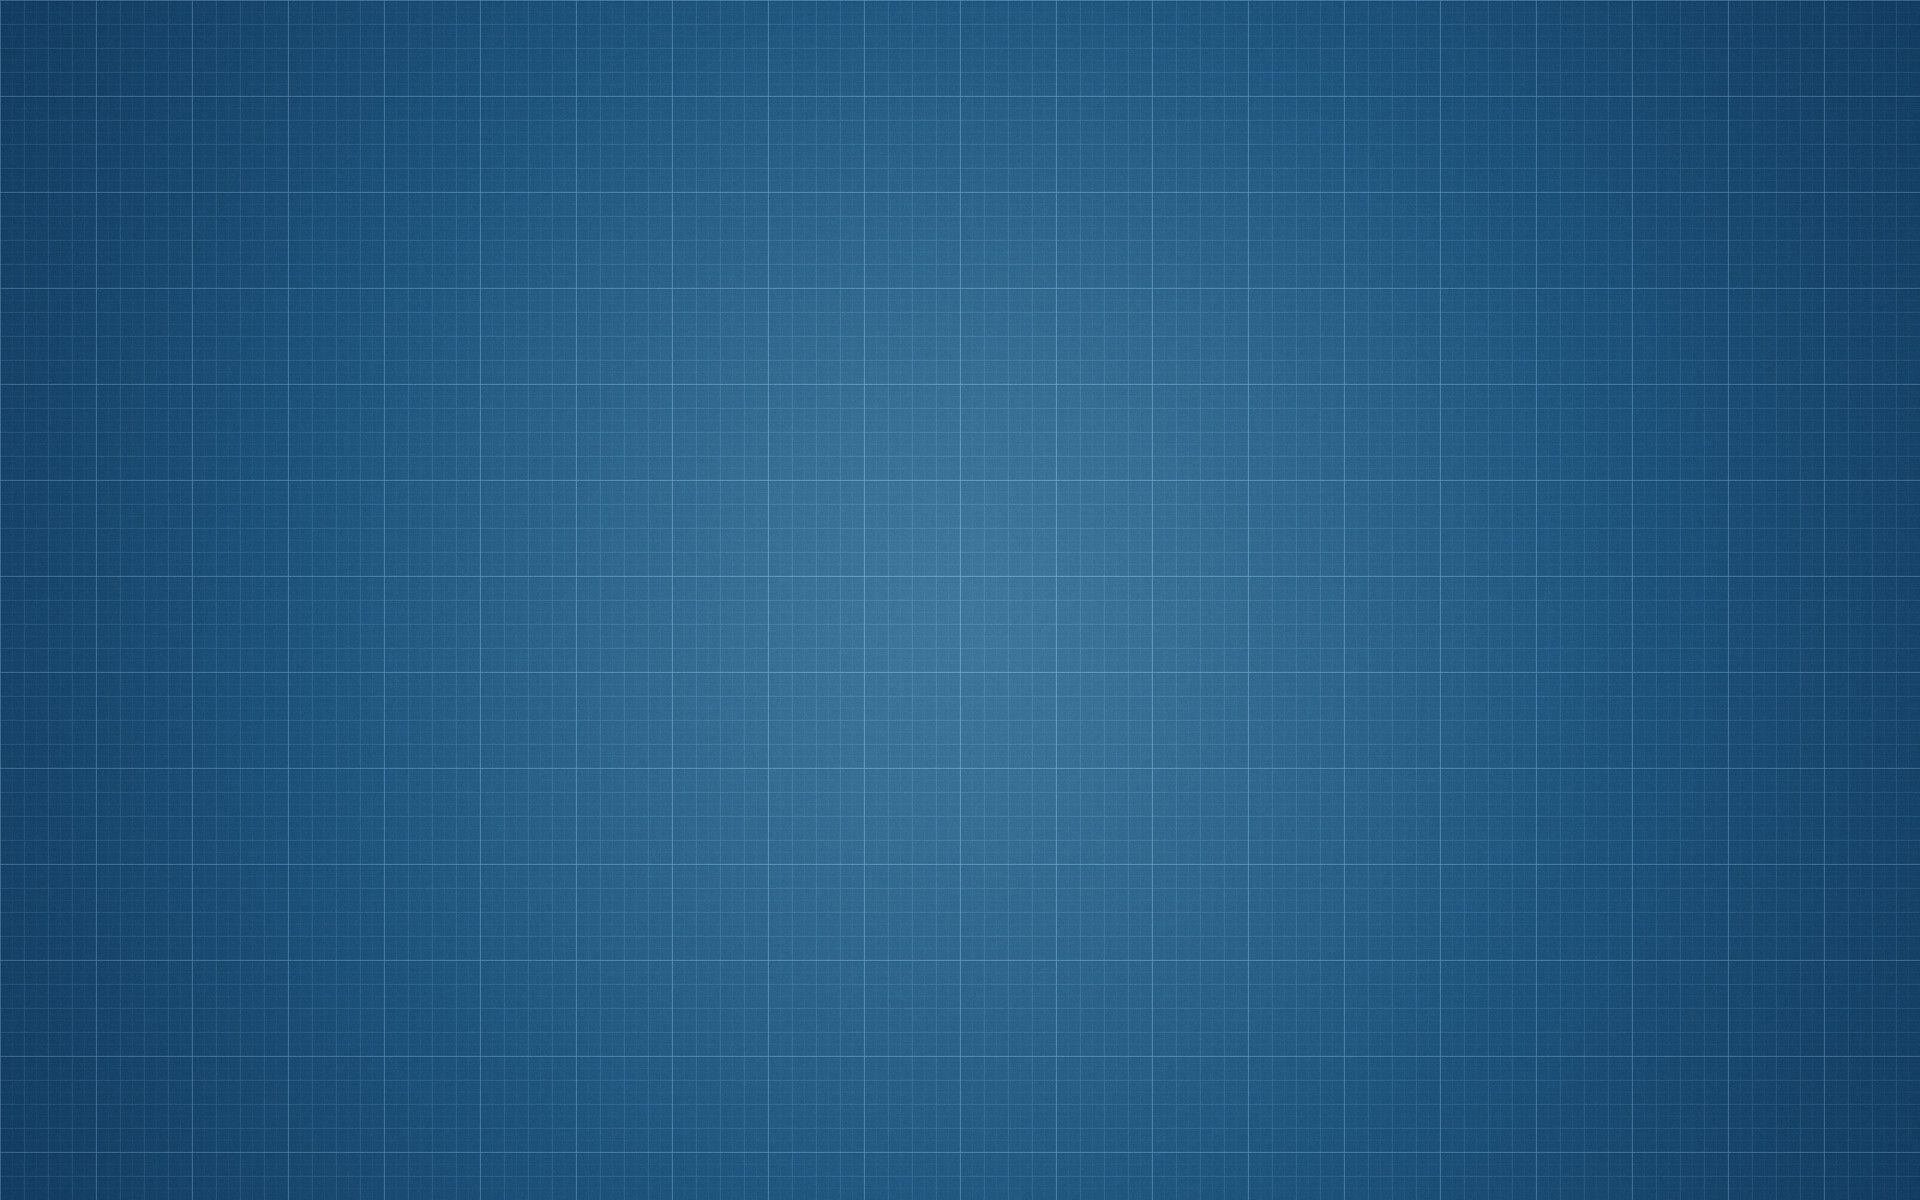 Custom OS Blueprint Wallpapers - CmdrKeene'-s Blog